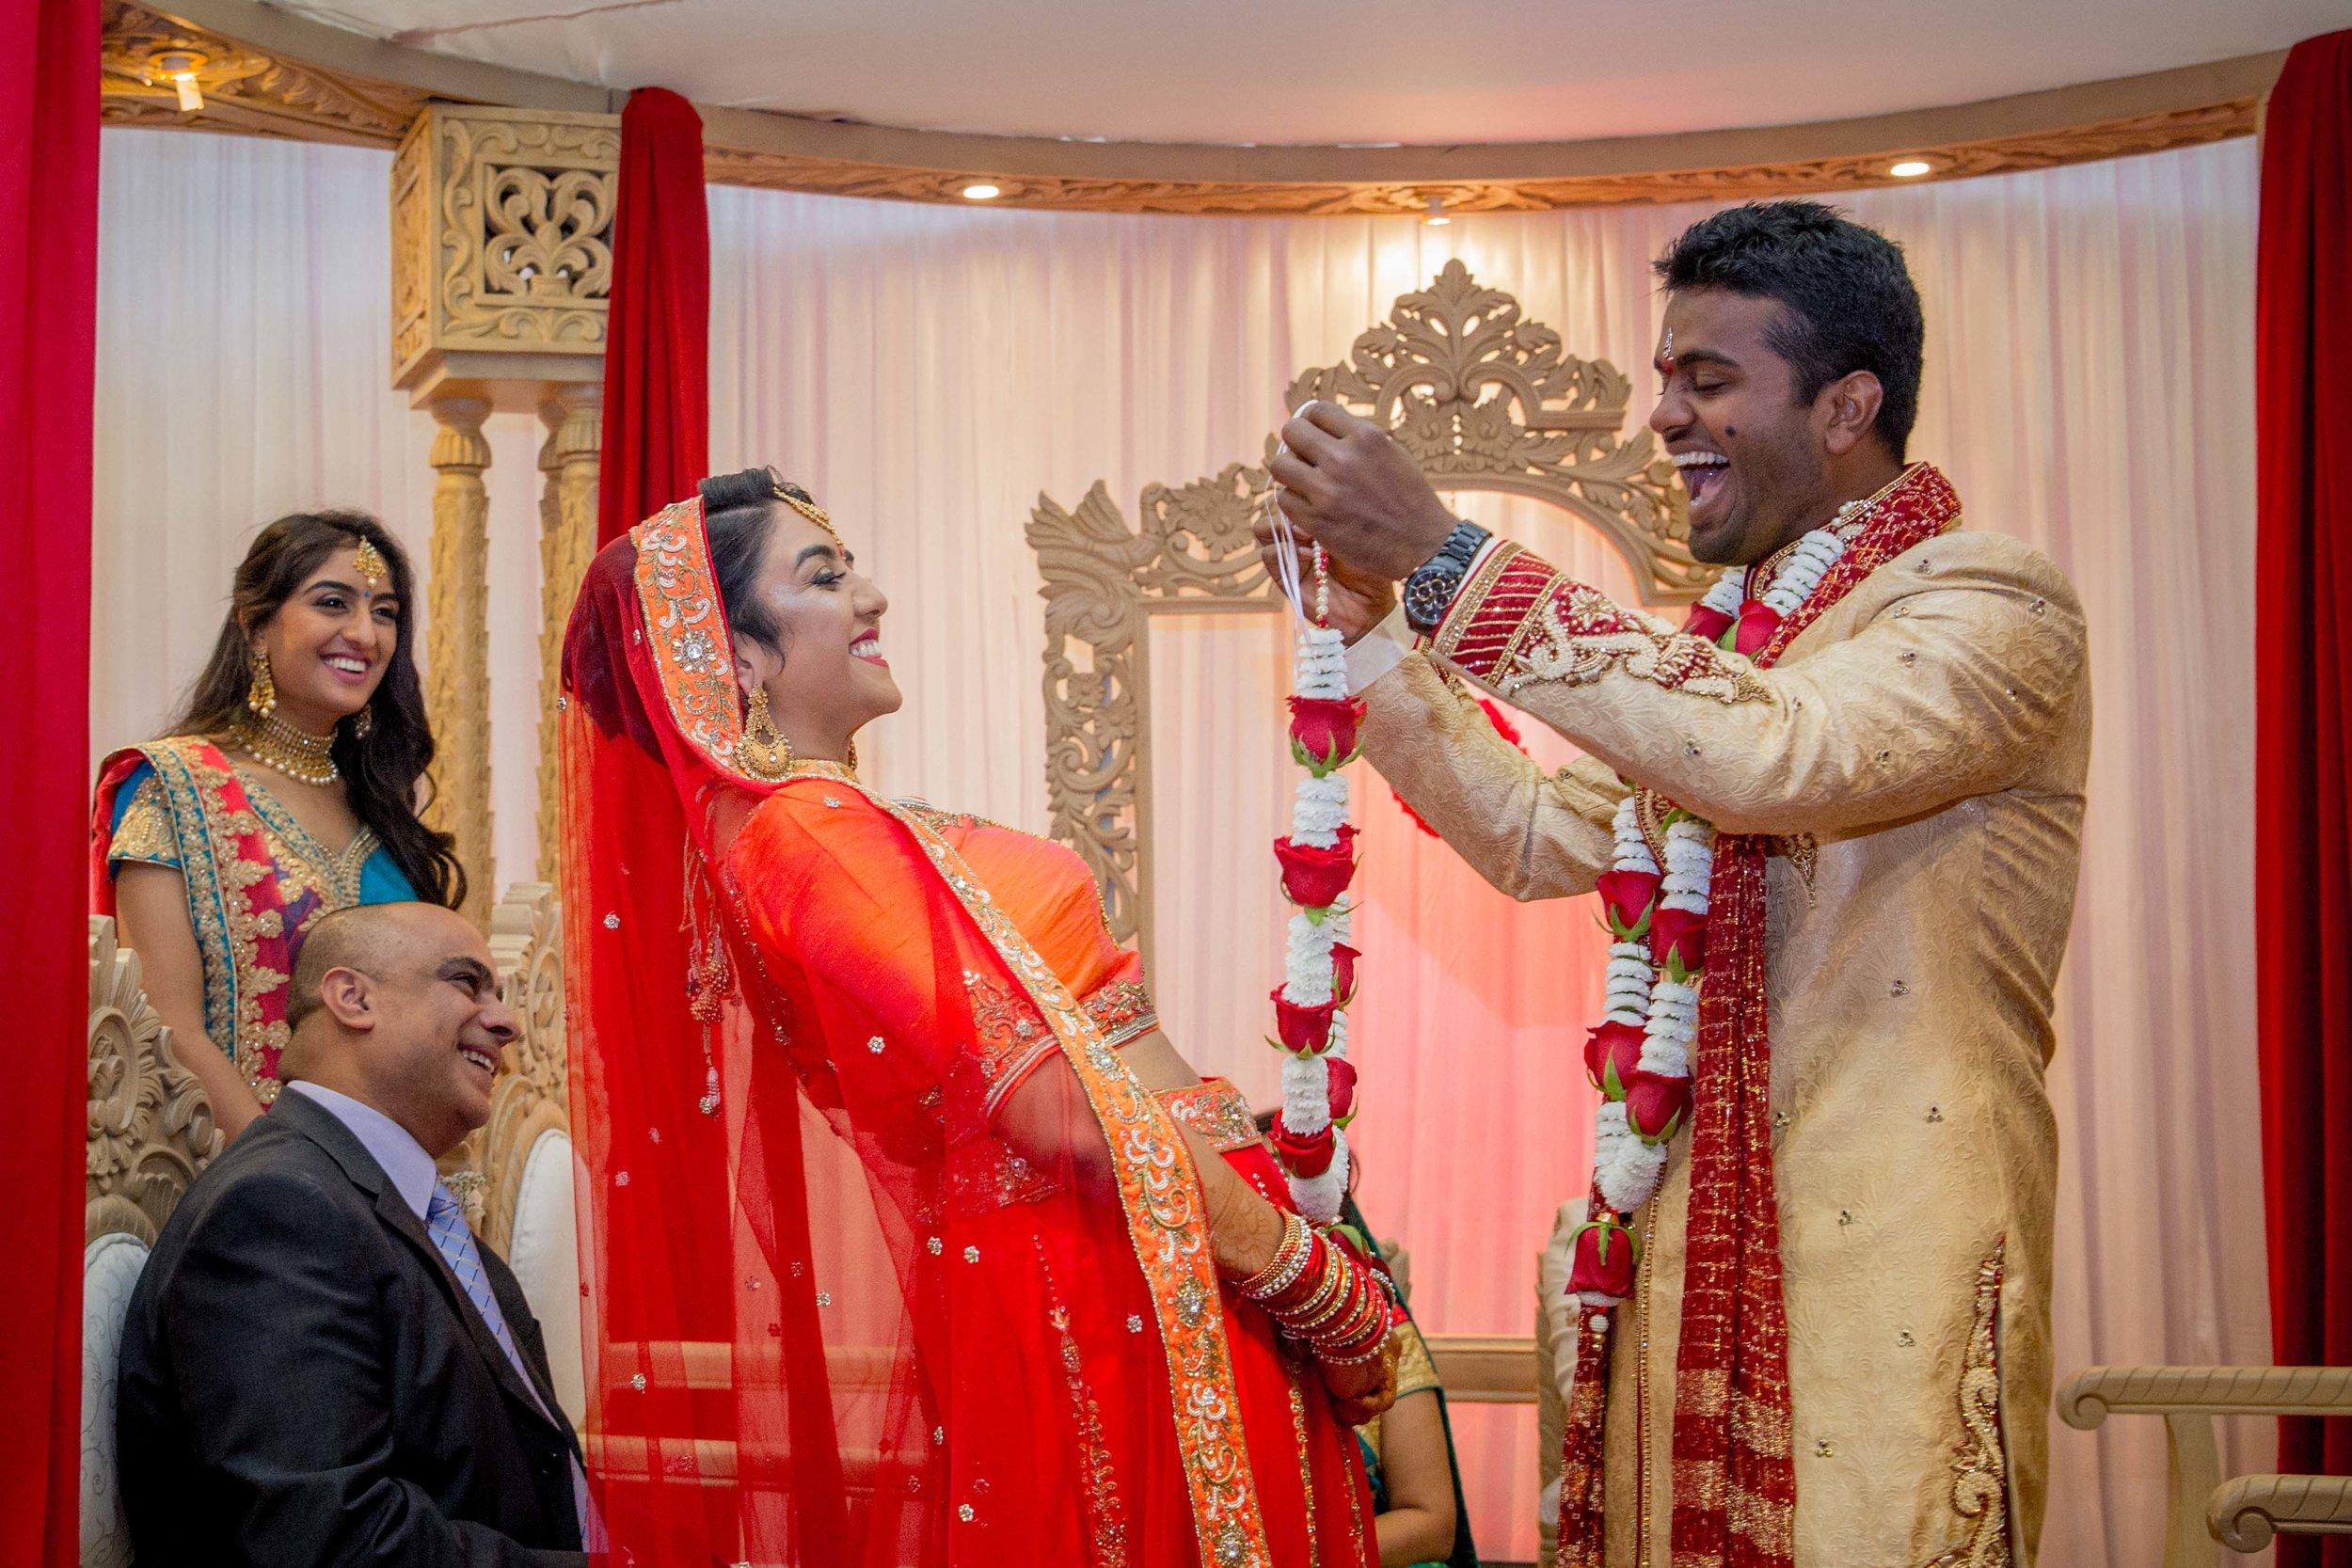 premier-banquetting-london-Hindu-asian-wedding-photographer-natalia-smith-photography-20.jpg